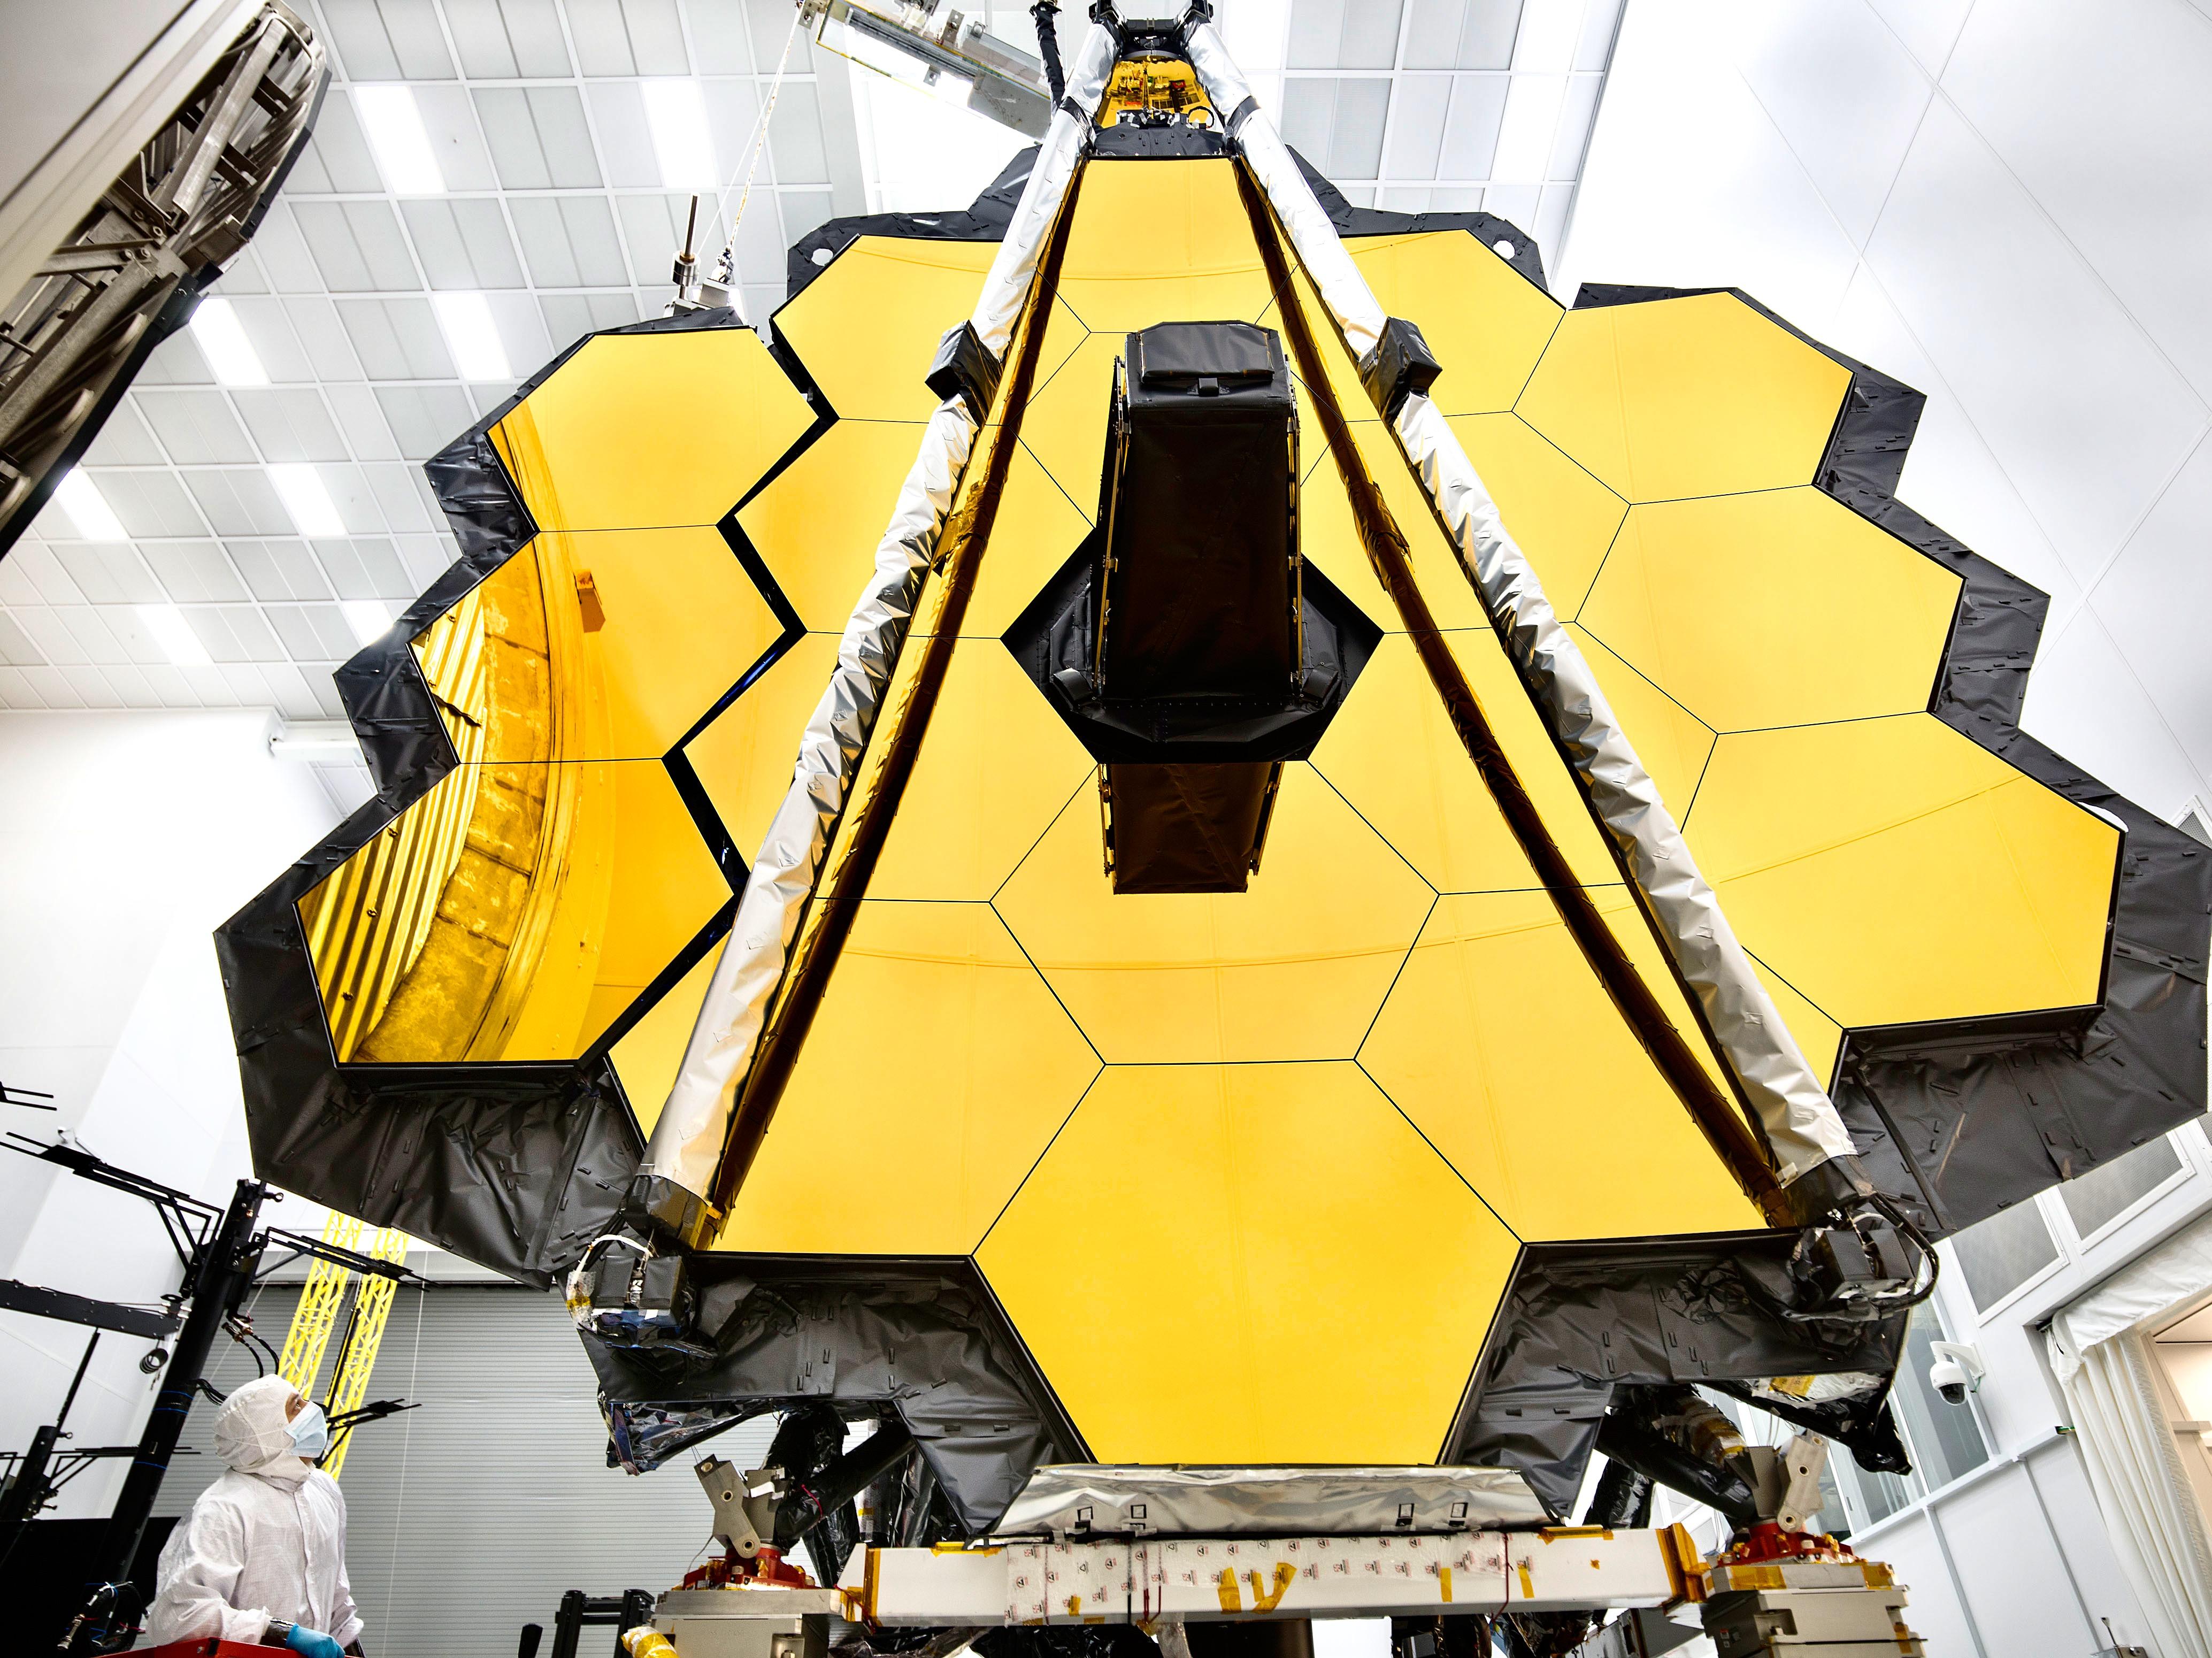 James Webb Space Telescope Arrives at Johnson Space Center ...